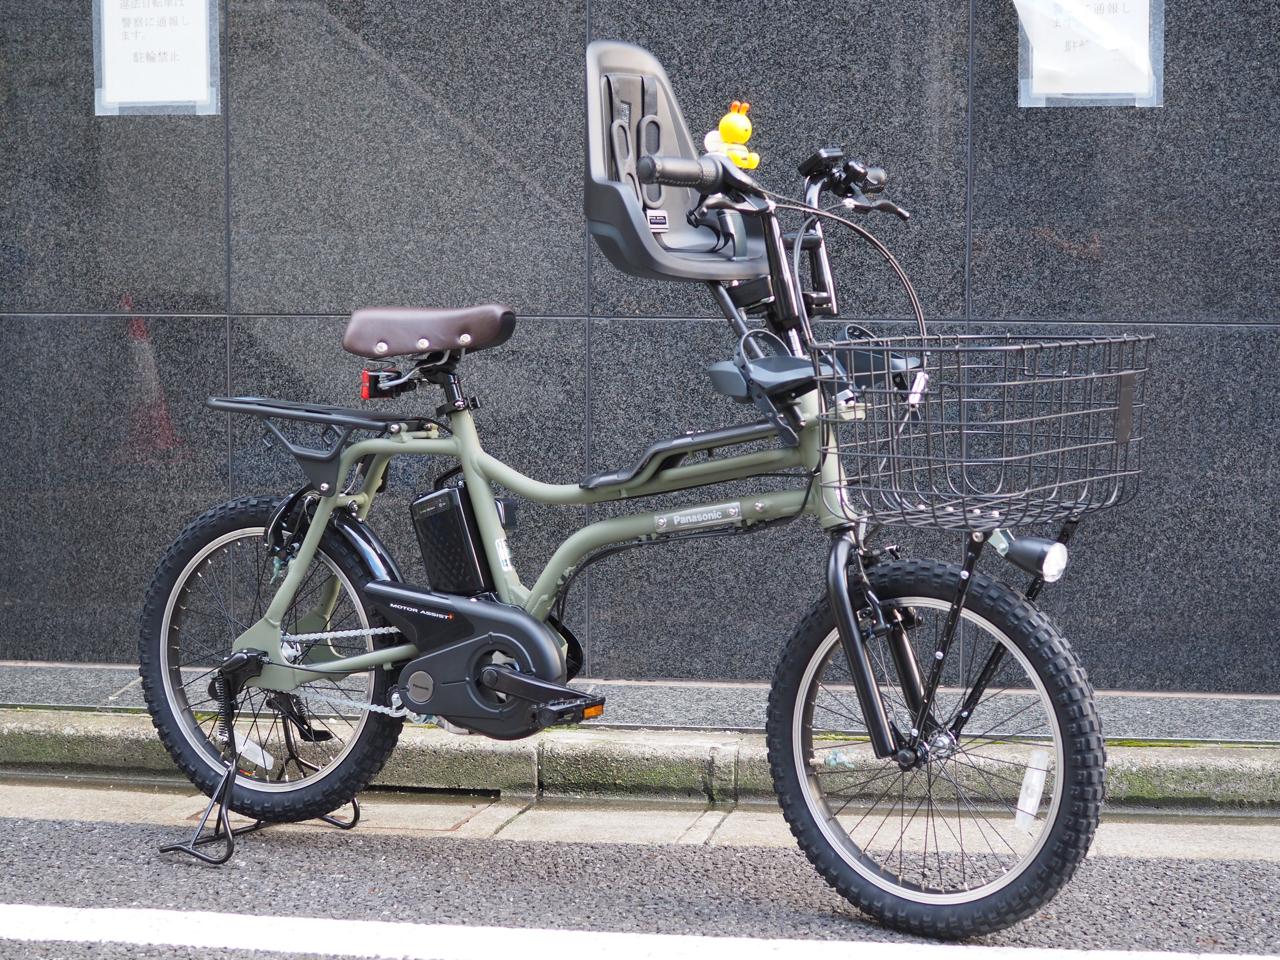 EZ,YEPP,PANASONIC,イーゼット,イェップ,電動自転車,子乗せ自転車,ボバイク,BOBIKE